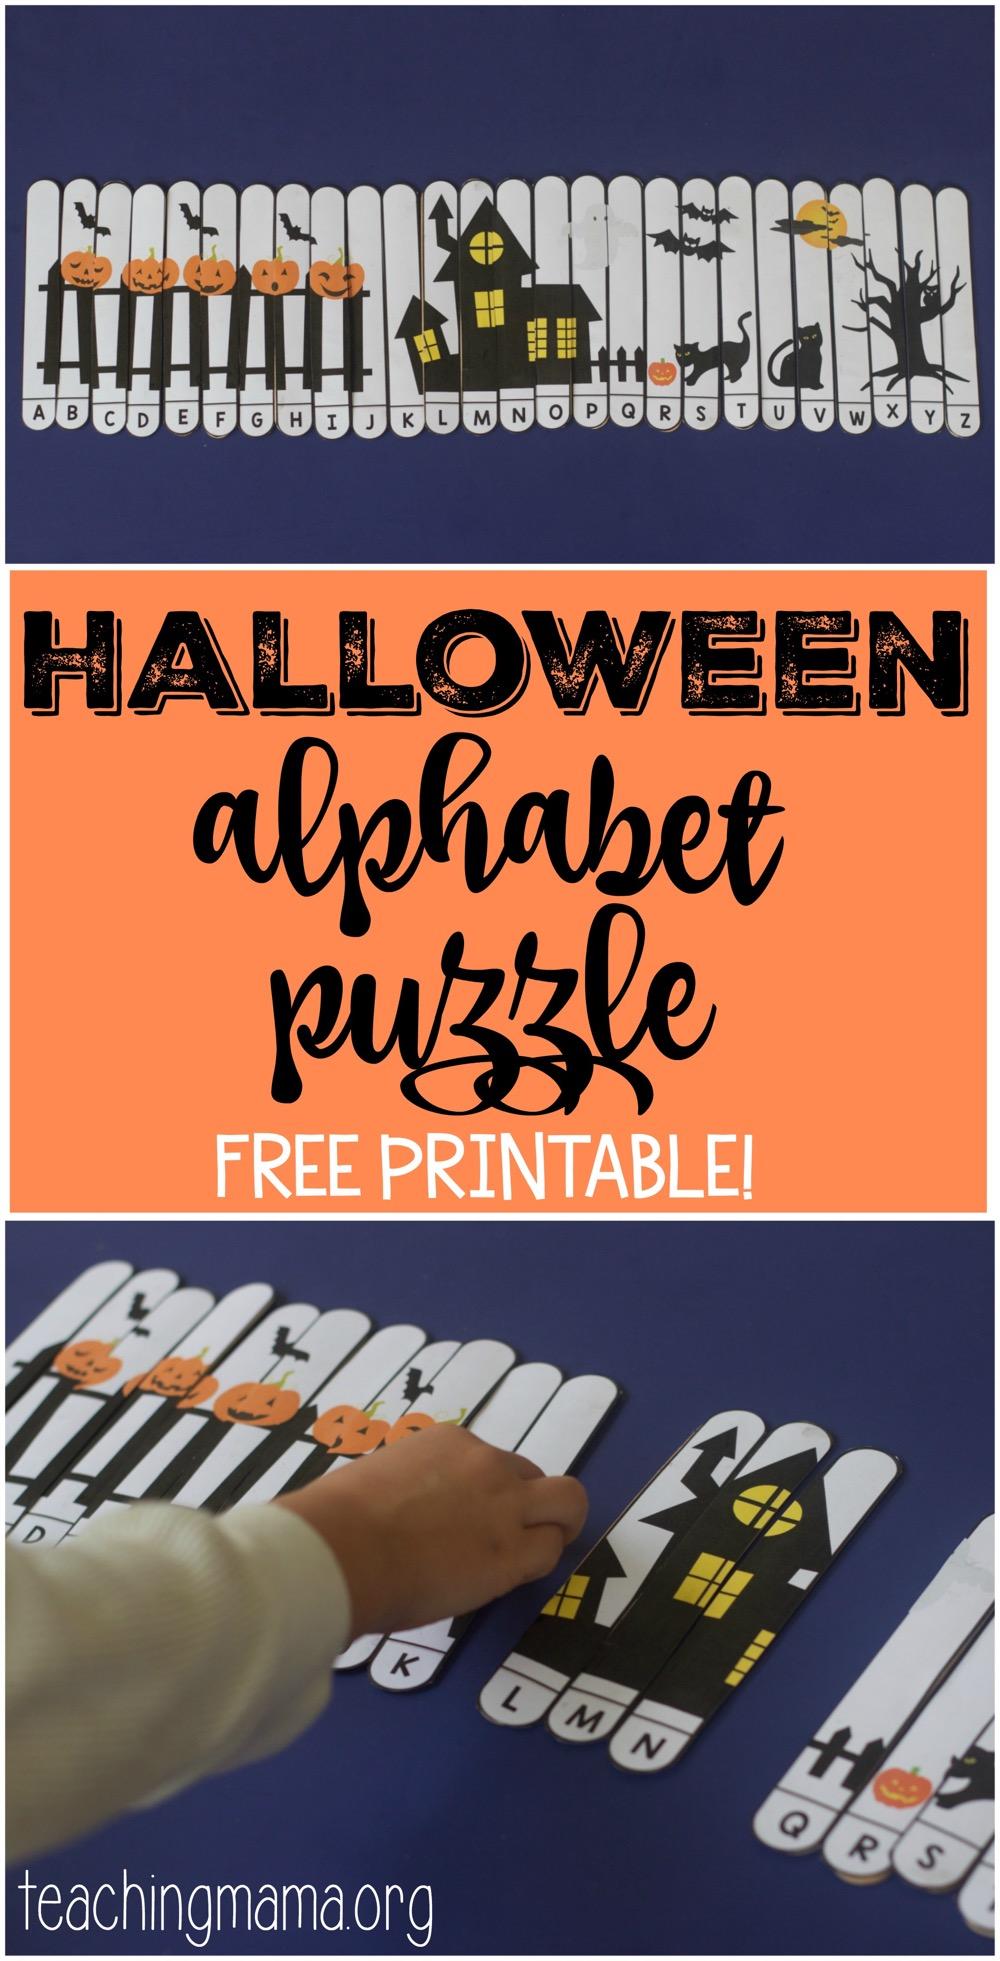 Halloween Alphabet Letter R Cat Witch Ryta: Halloween Alphabet Puzzle